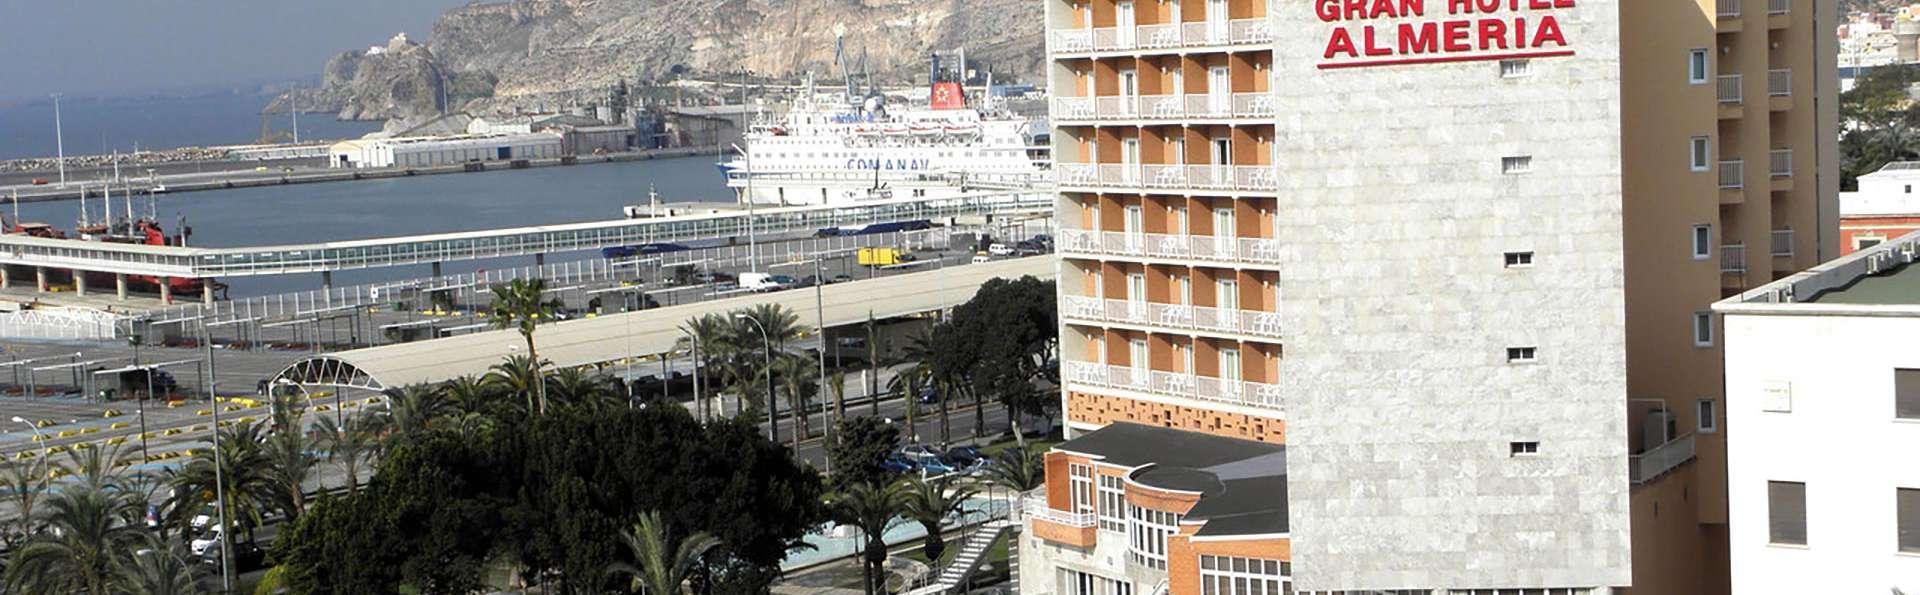 Ohtels Gran Hotel Almería - EDIT_FRONT_04.jpg